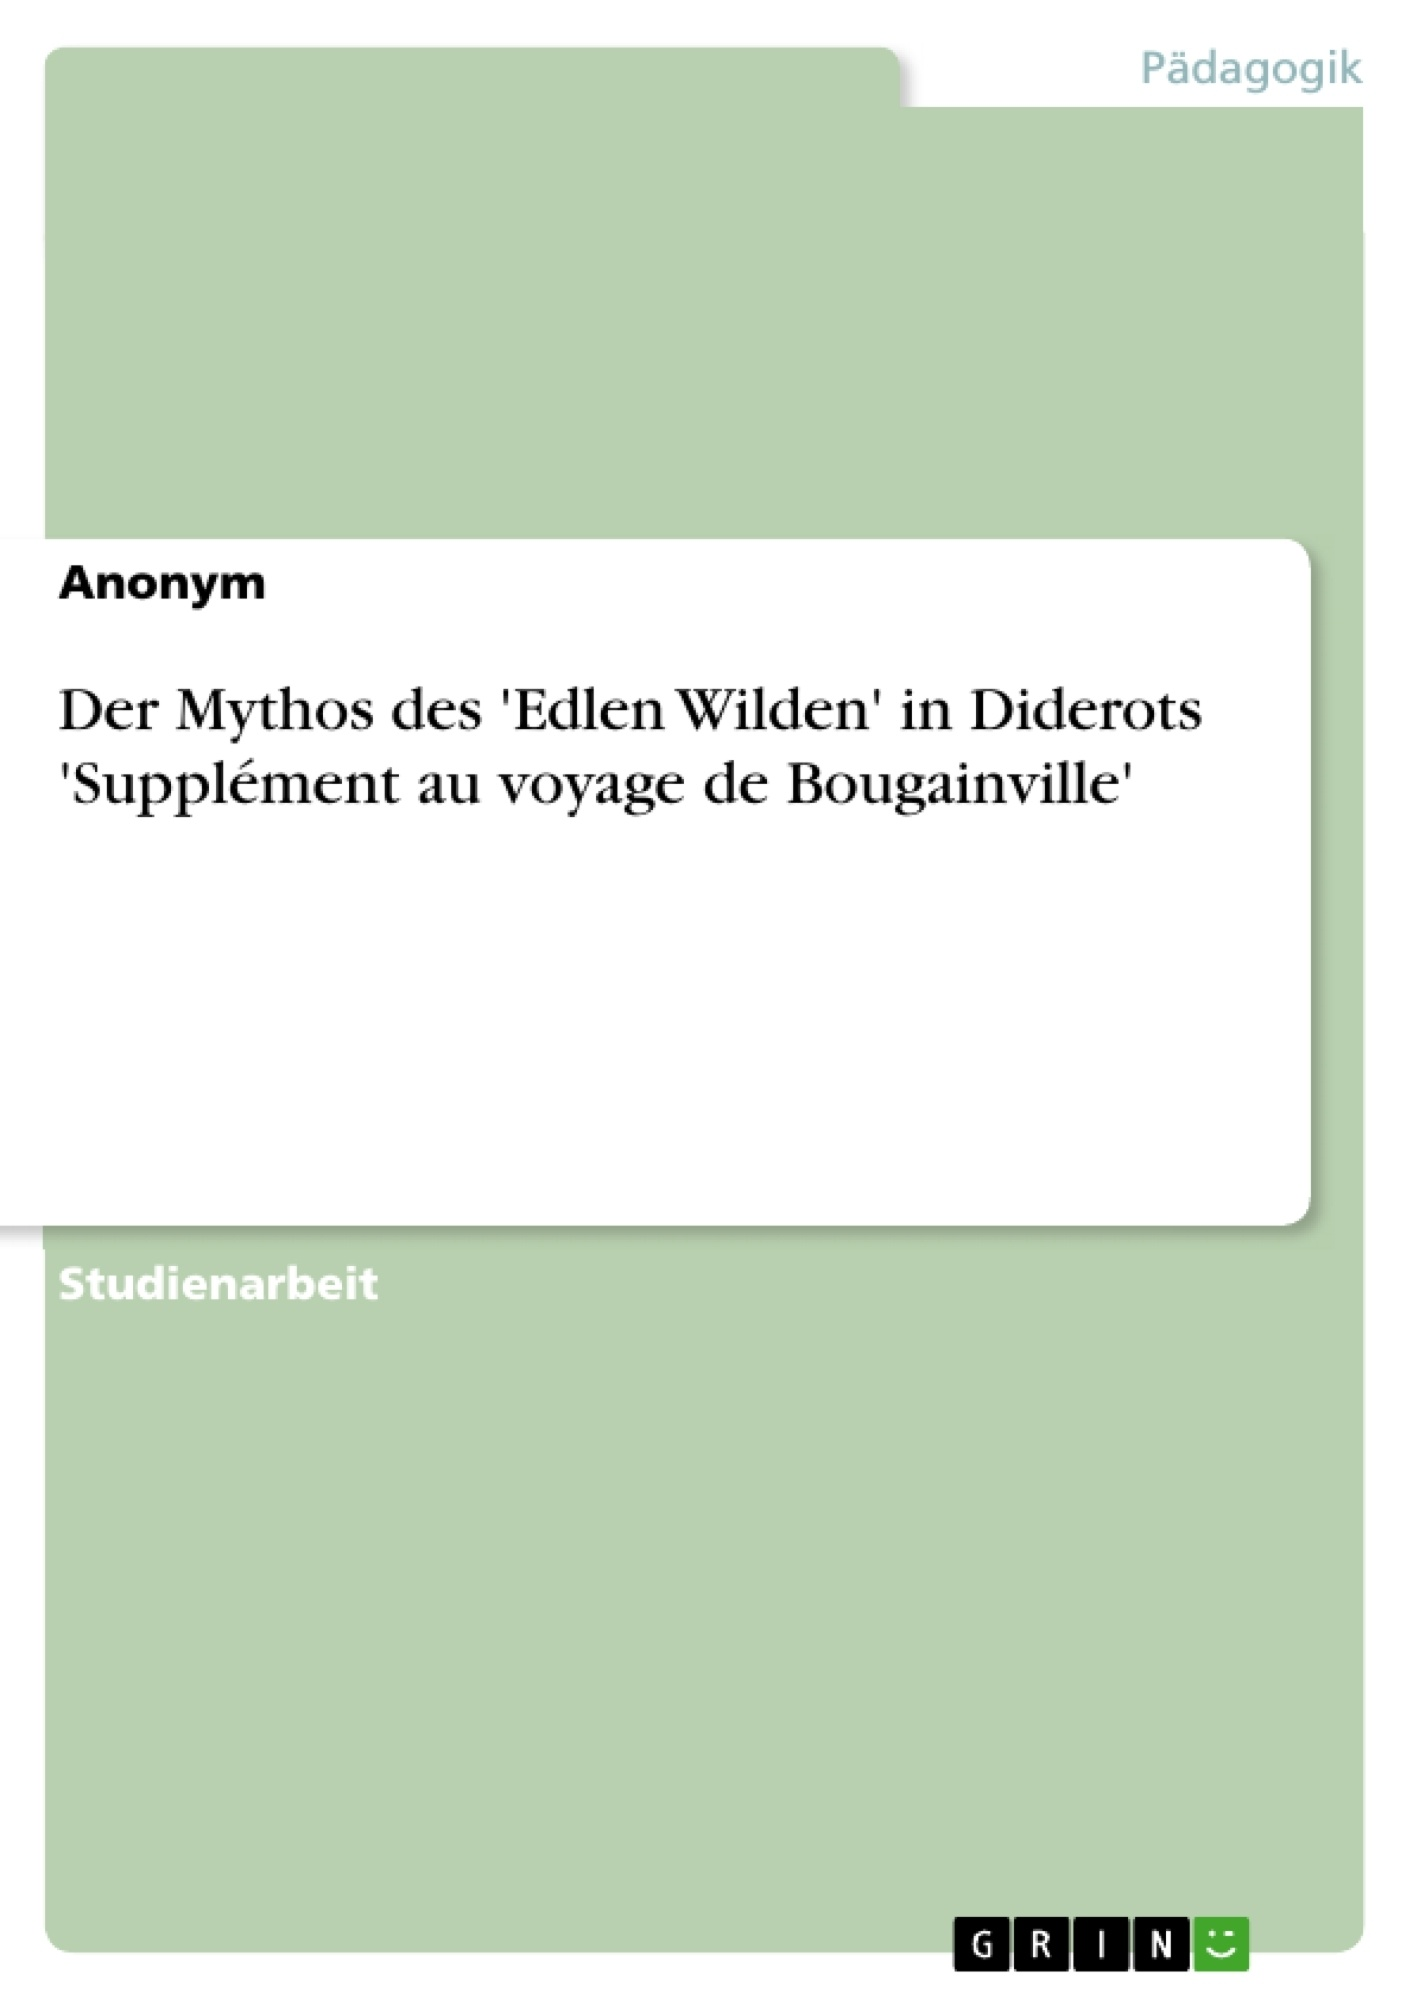 Titel: Der Mythos des 'Edlen Wilden' in Diderots 'Supplément au voyage de Bougainville'